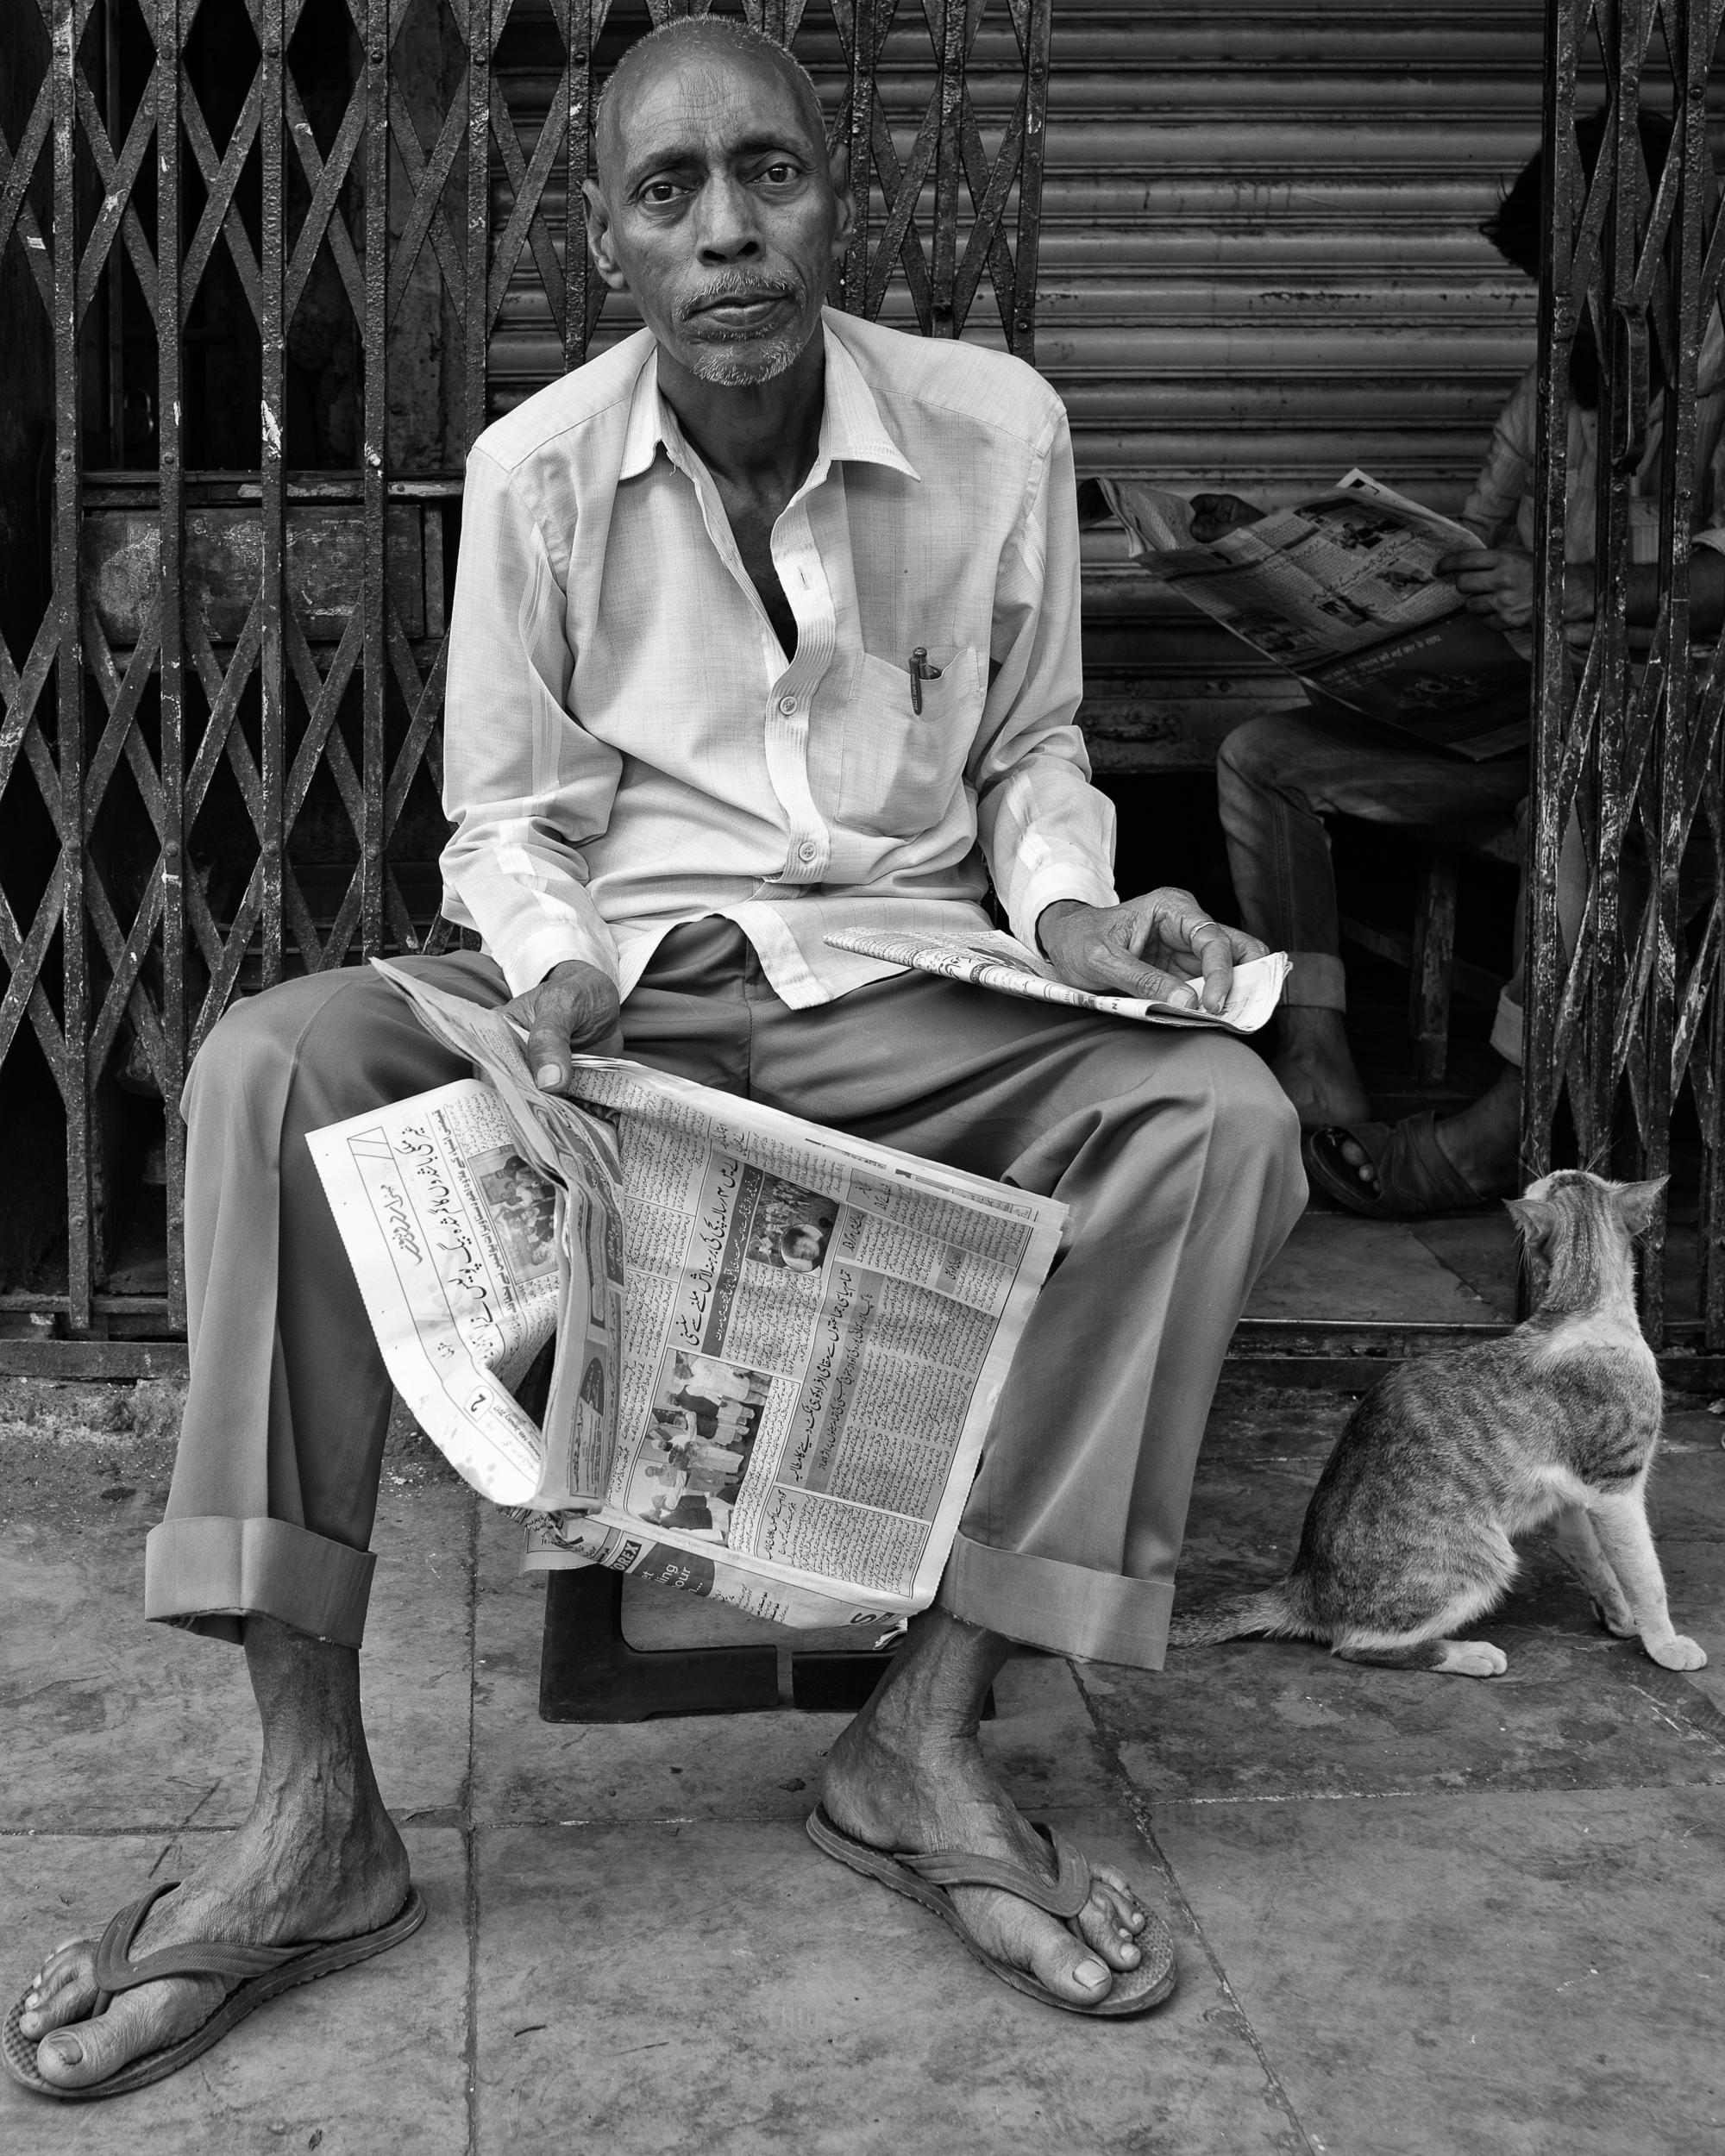 gentleman with his paper, mumbai